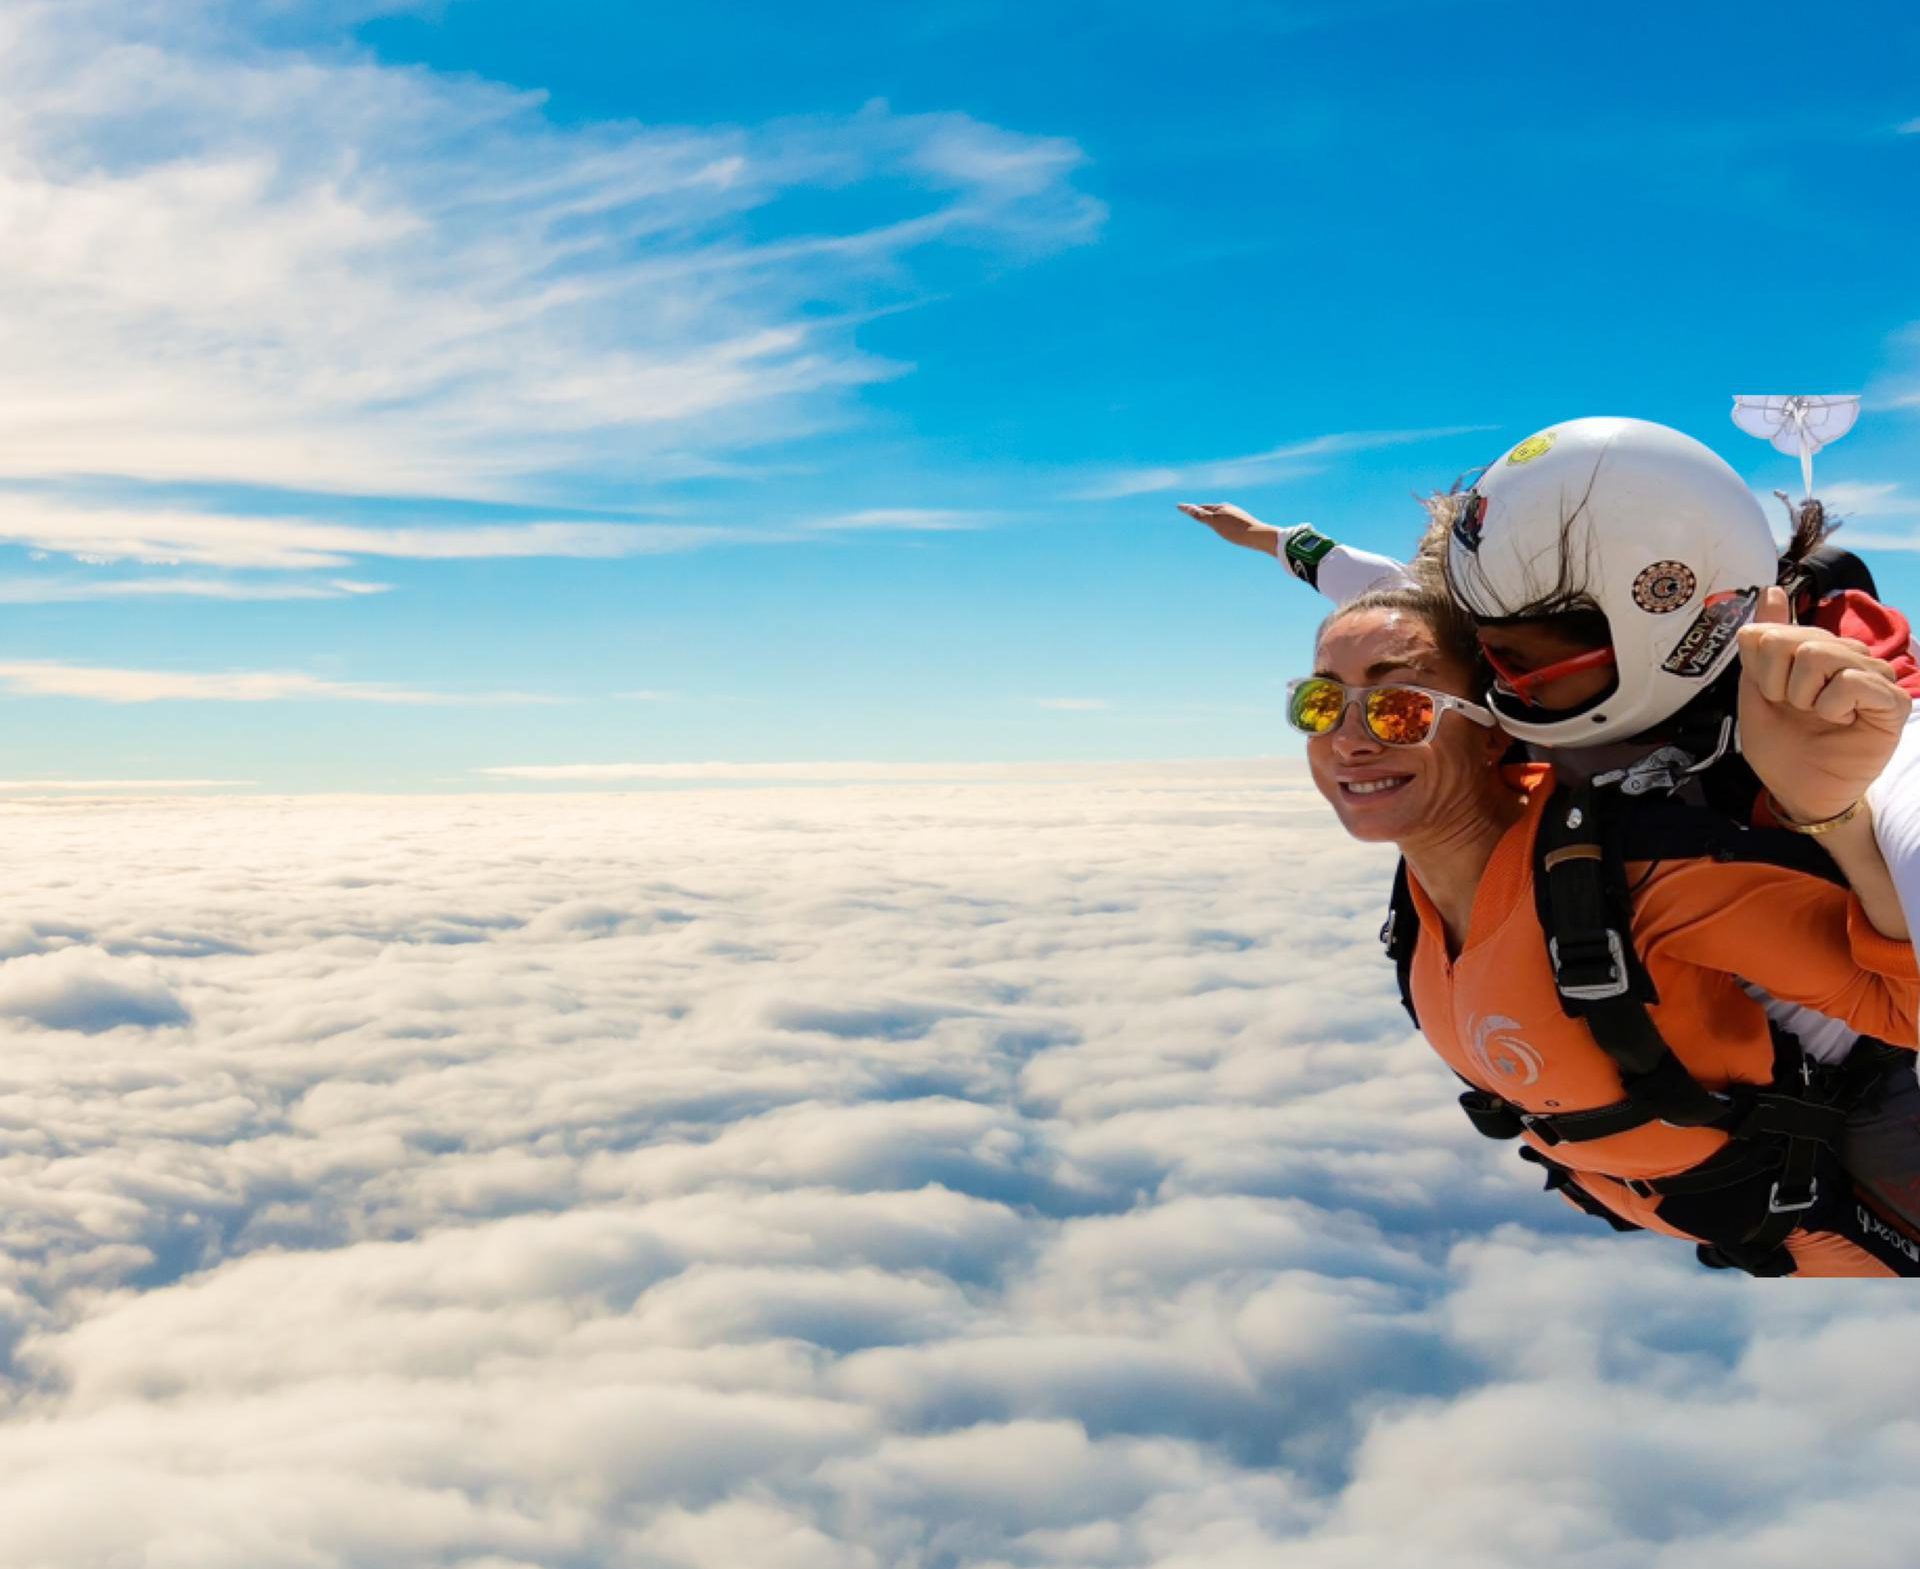 Portugal tandem skydiving experience in Alentejo: 16,400ft/5,000m